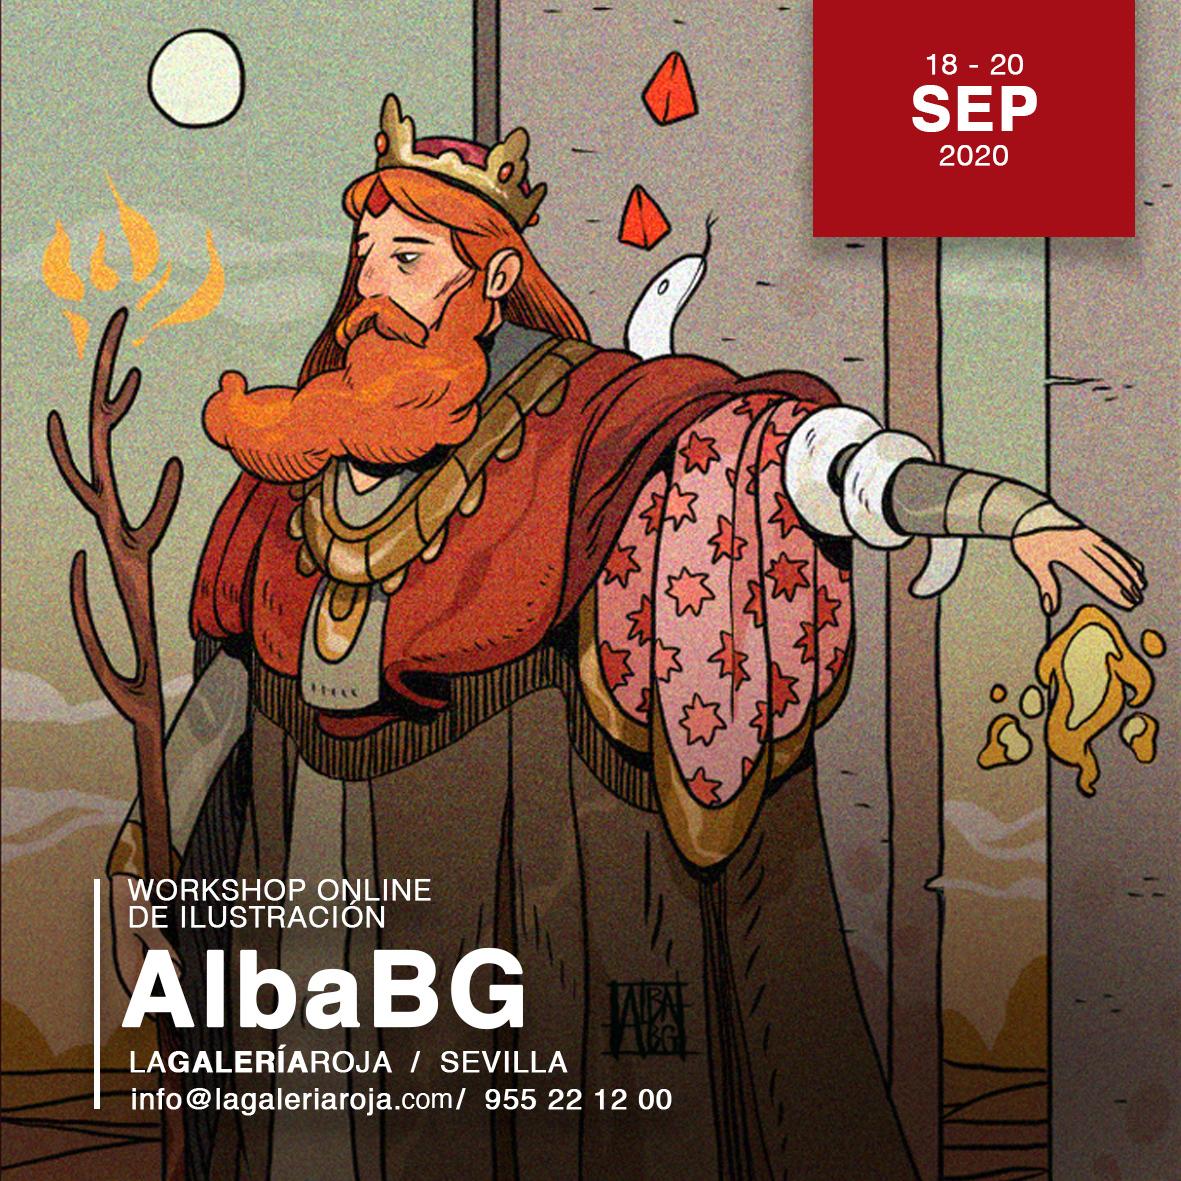 ALBABG